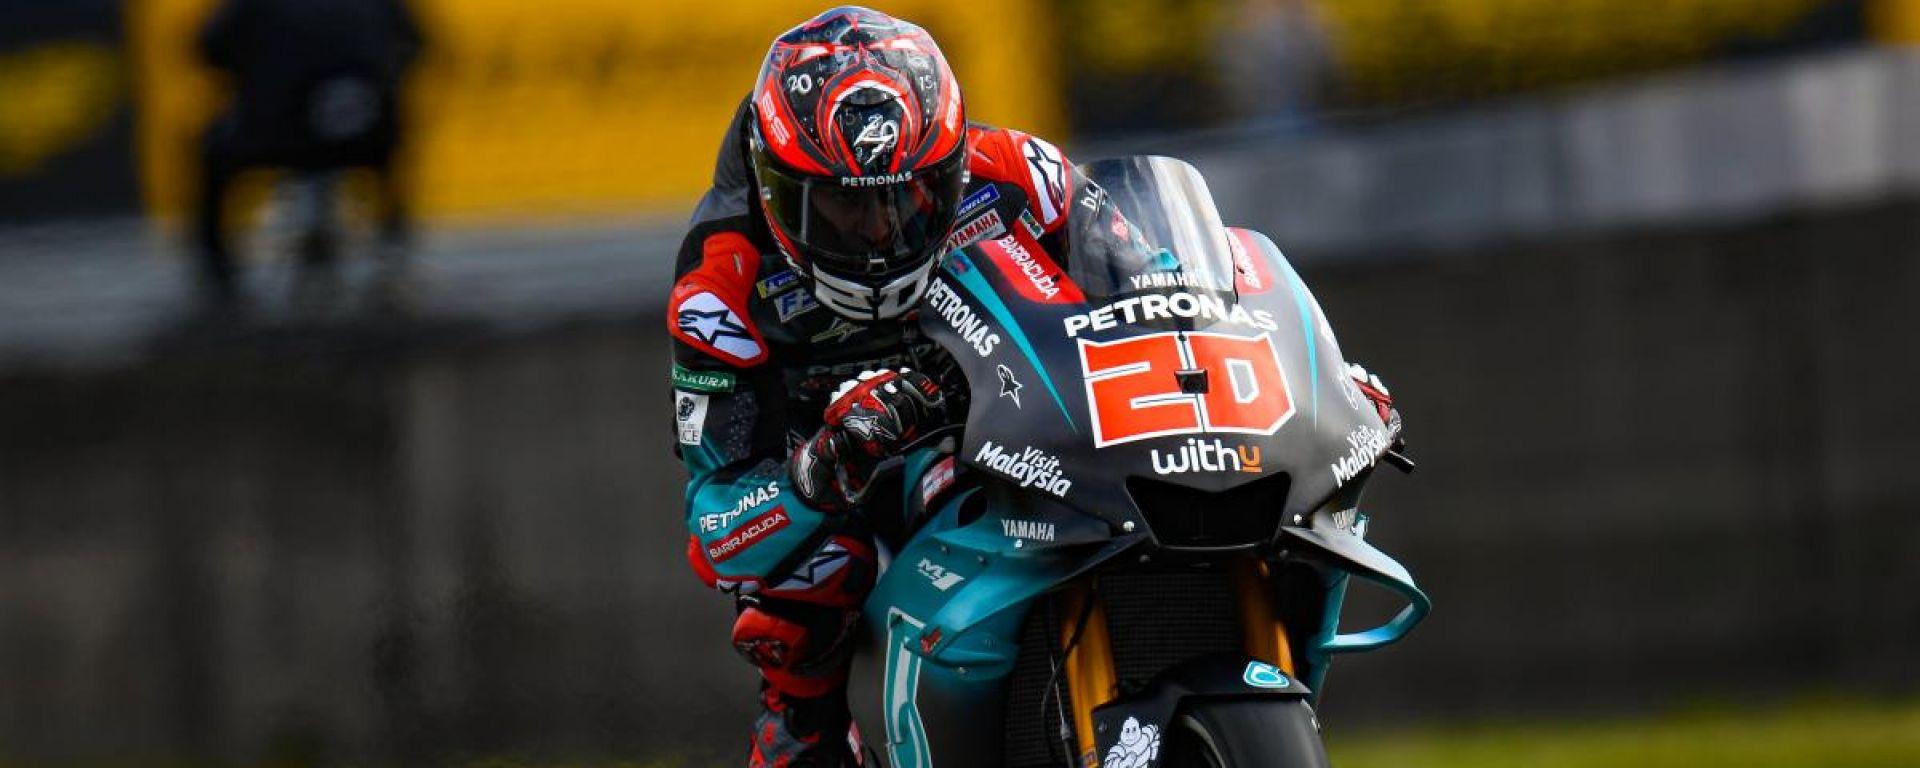 MotoGP Assen, Quartararo in pole davanti a Vinales. 14° Rossi